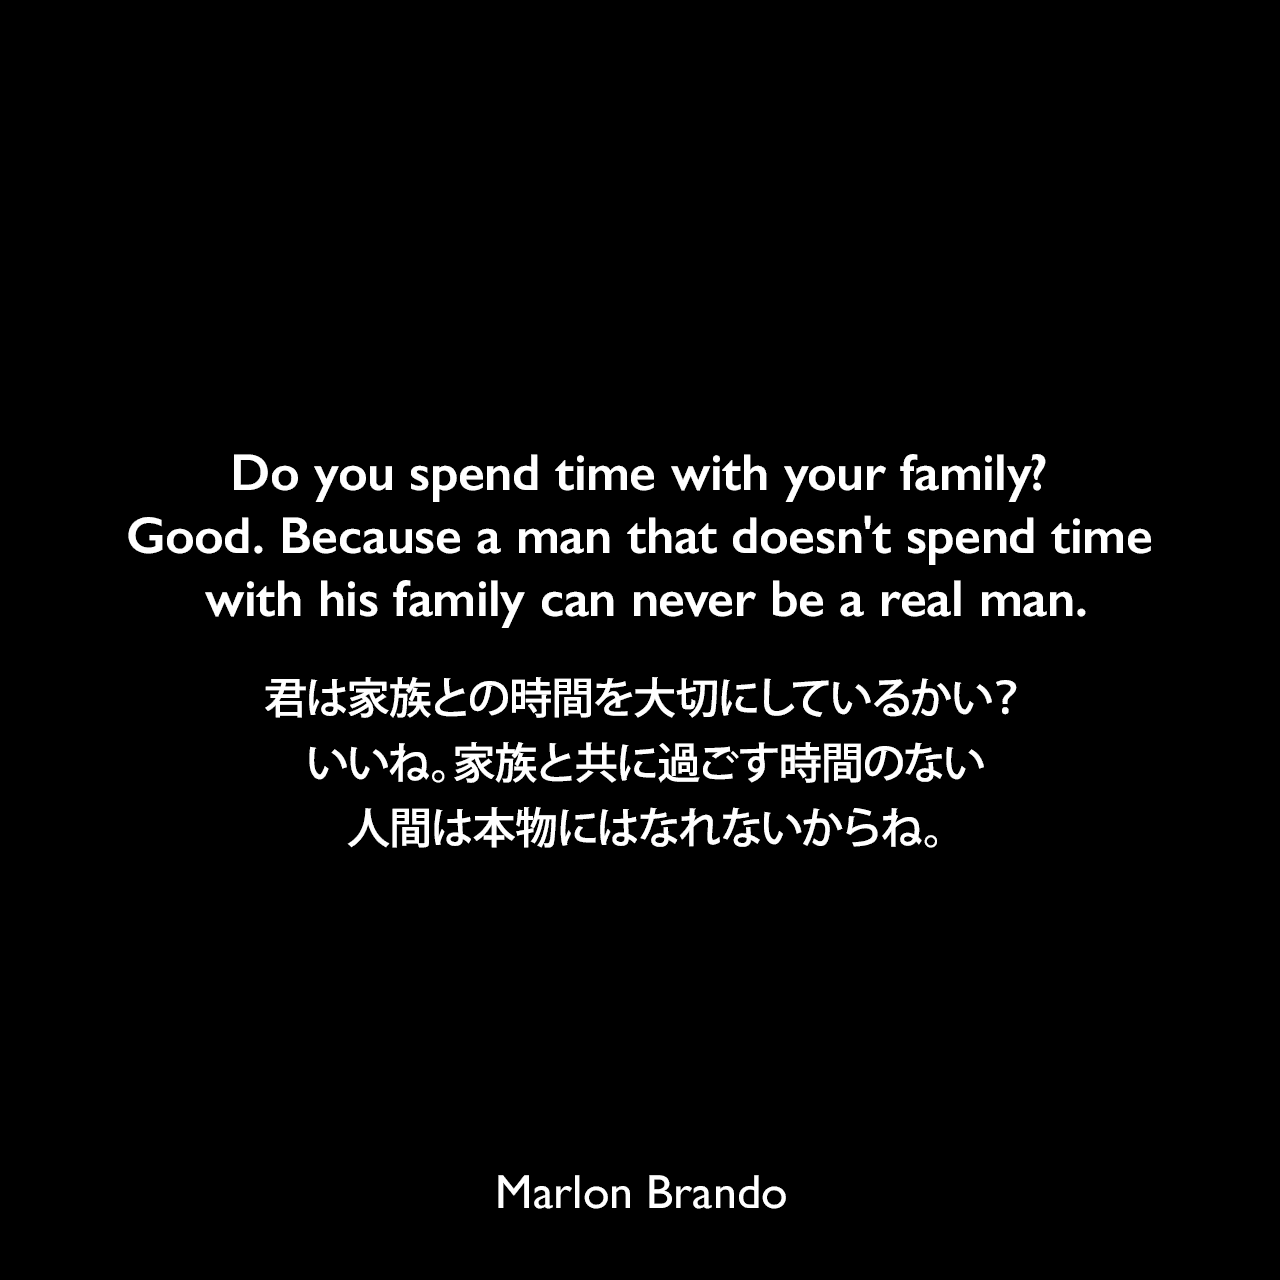 Do you spend time with your family? Good. Because a man that doesn't spend time with his family can never be a real man.君は家族との時間を大切にしているかい?いいね。家族と共に過ごす時間のない人間は本物にはなれないからね。Marlon Brando